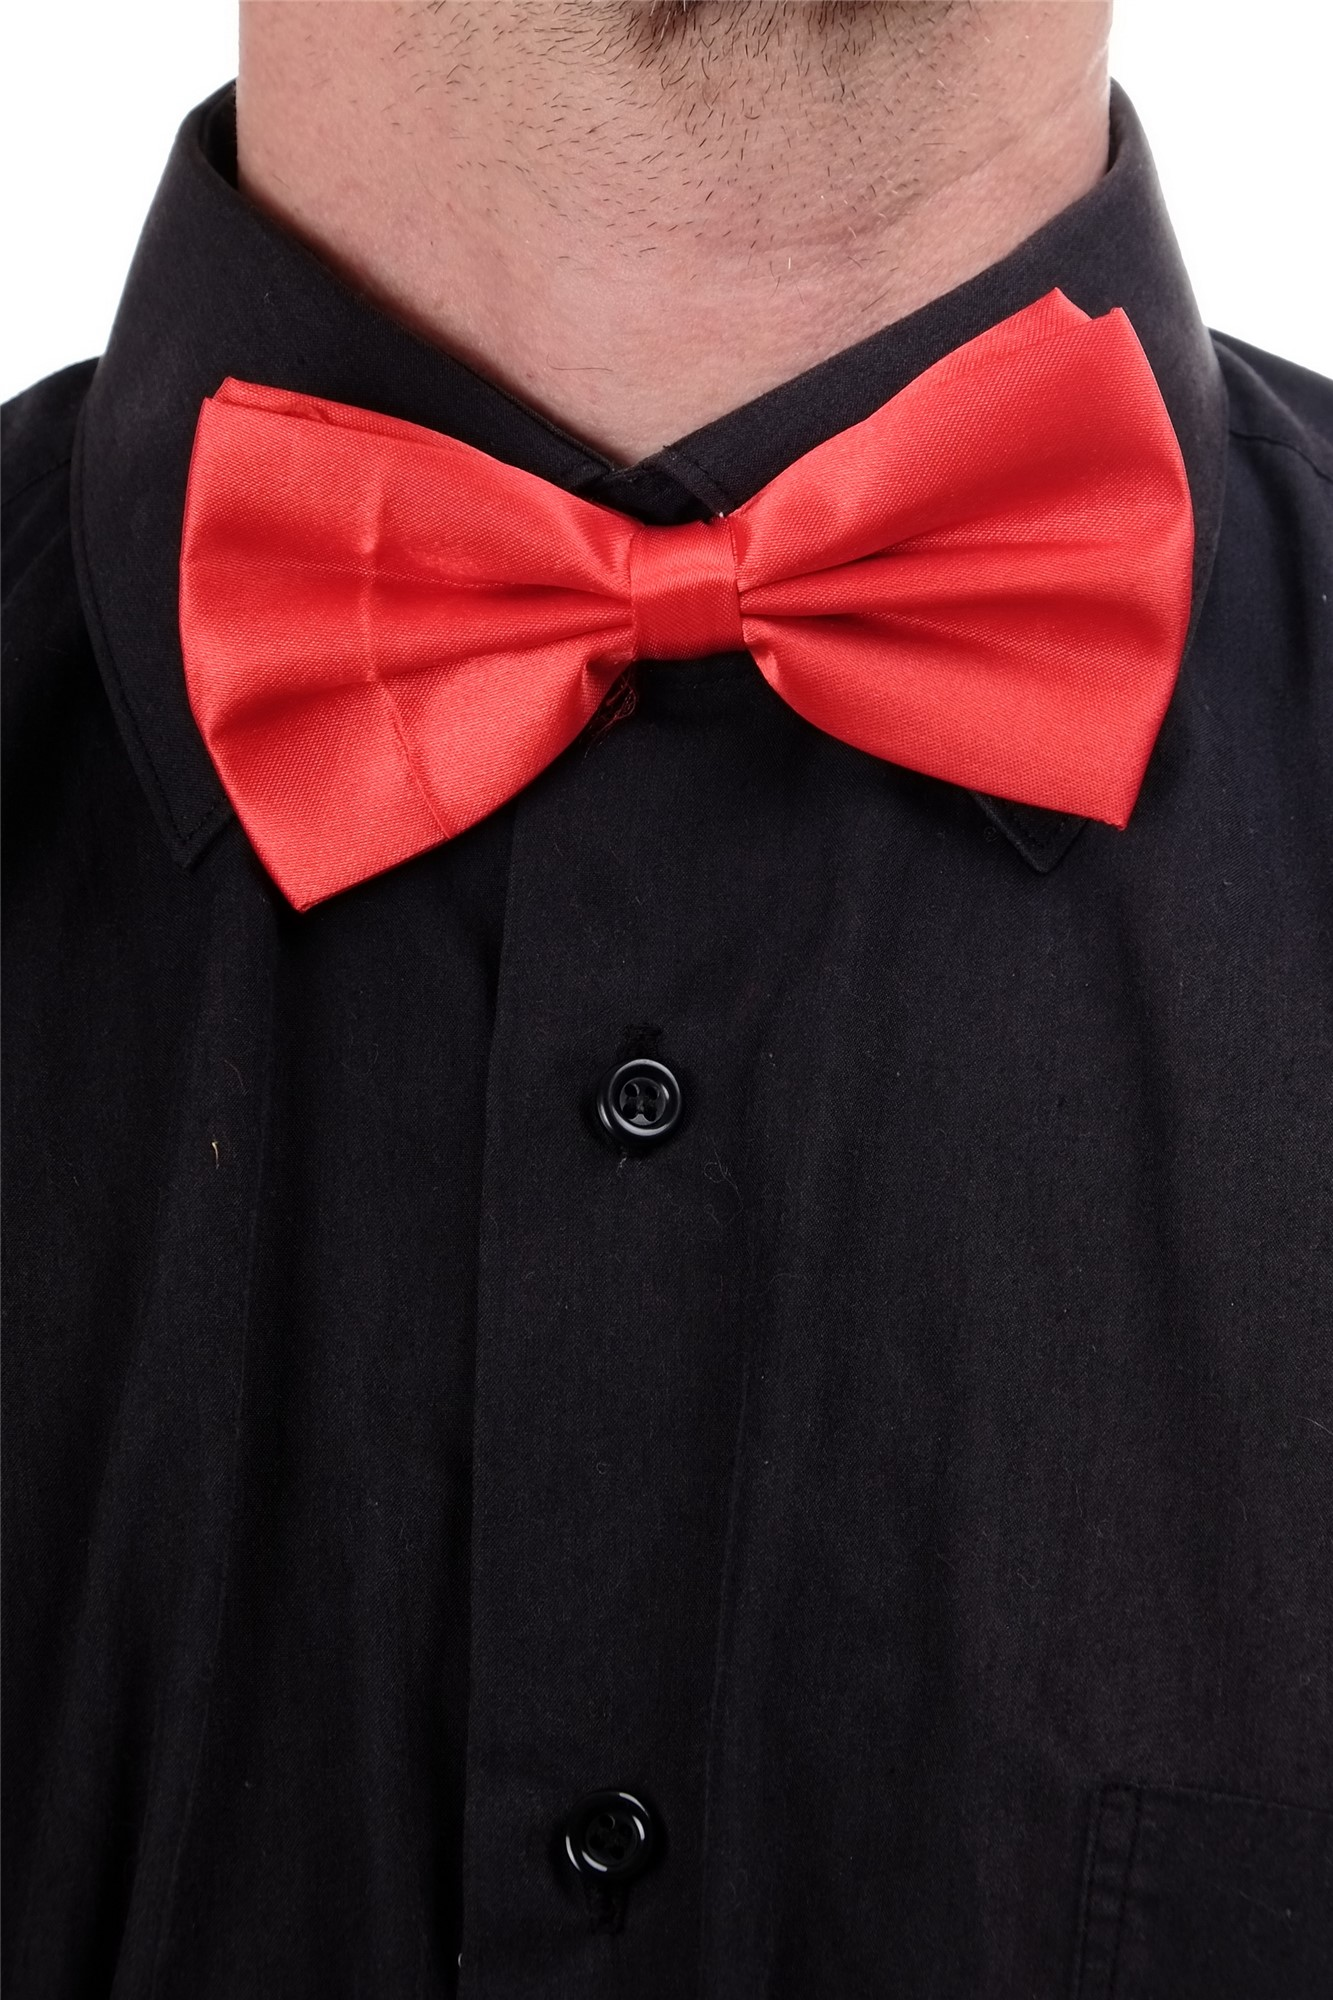 Halloween Karneval Fliege Bowtie Dompteur Zirkusdirektor Clown Rot W-071R-red